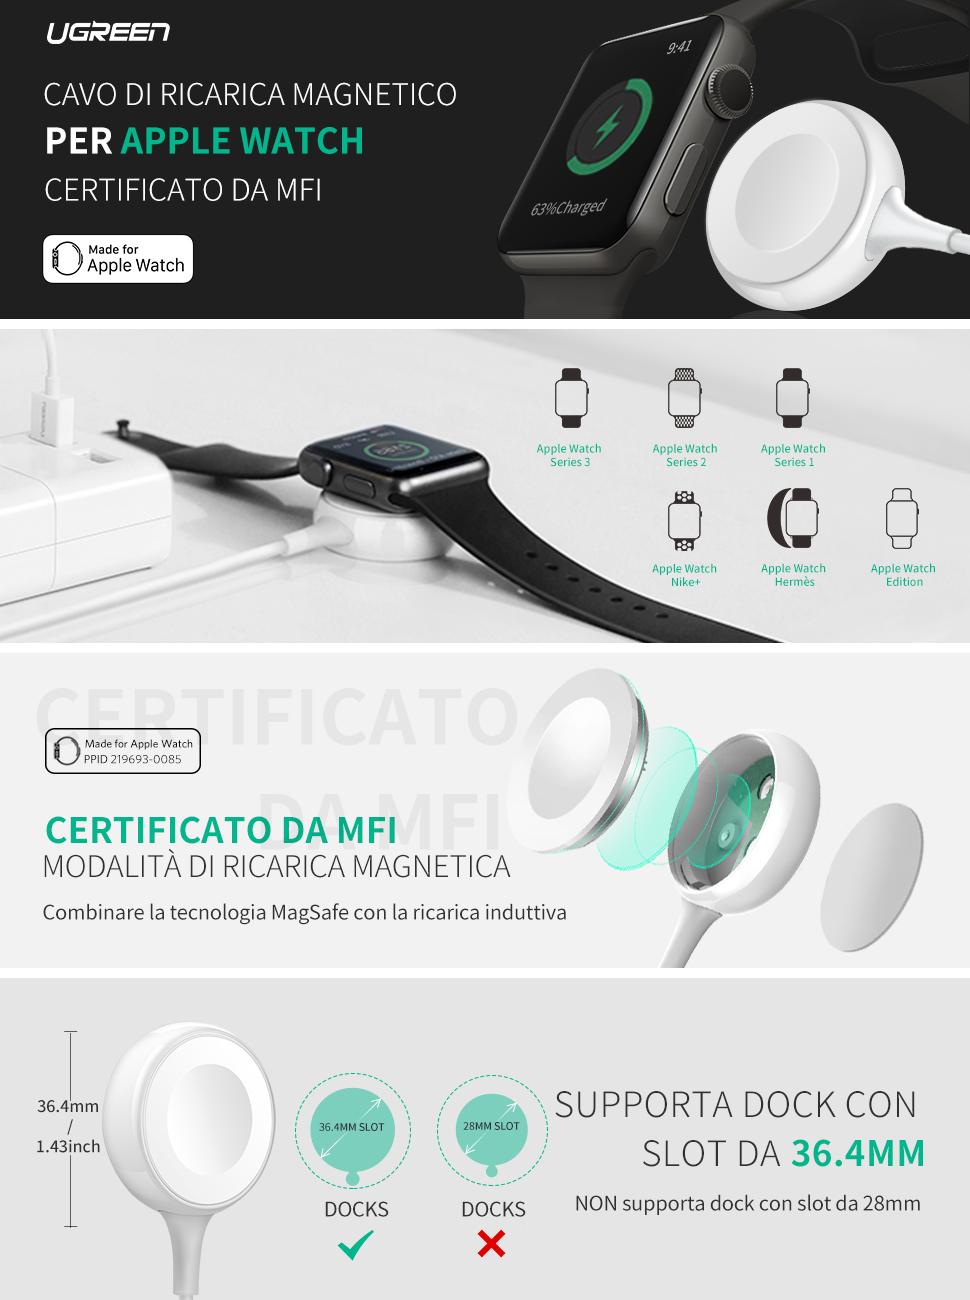 UGREEN Caricatore Apple Watch, Cavo Magnetico Portatile